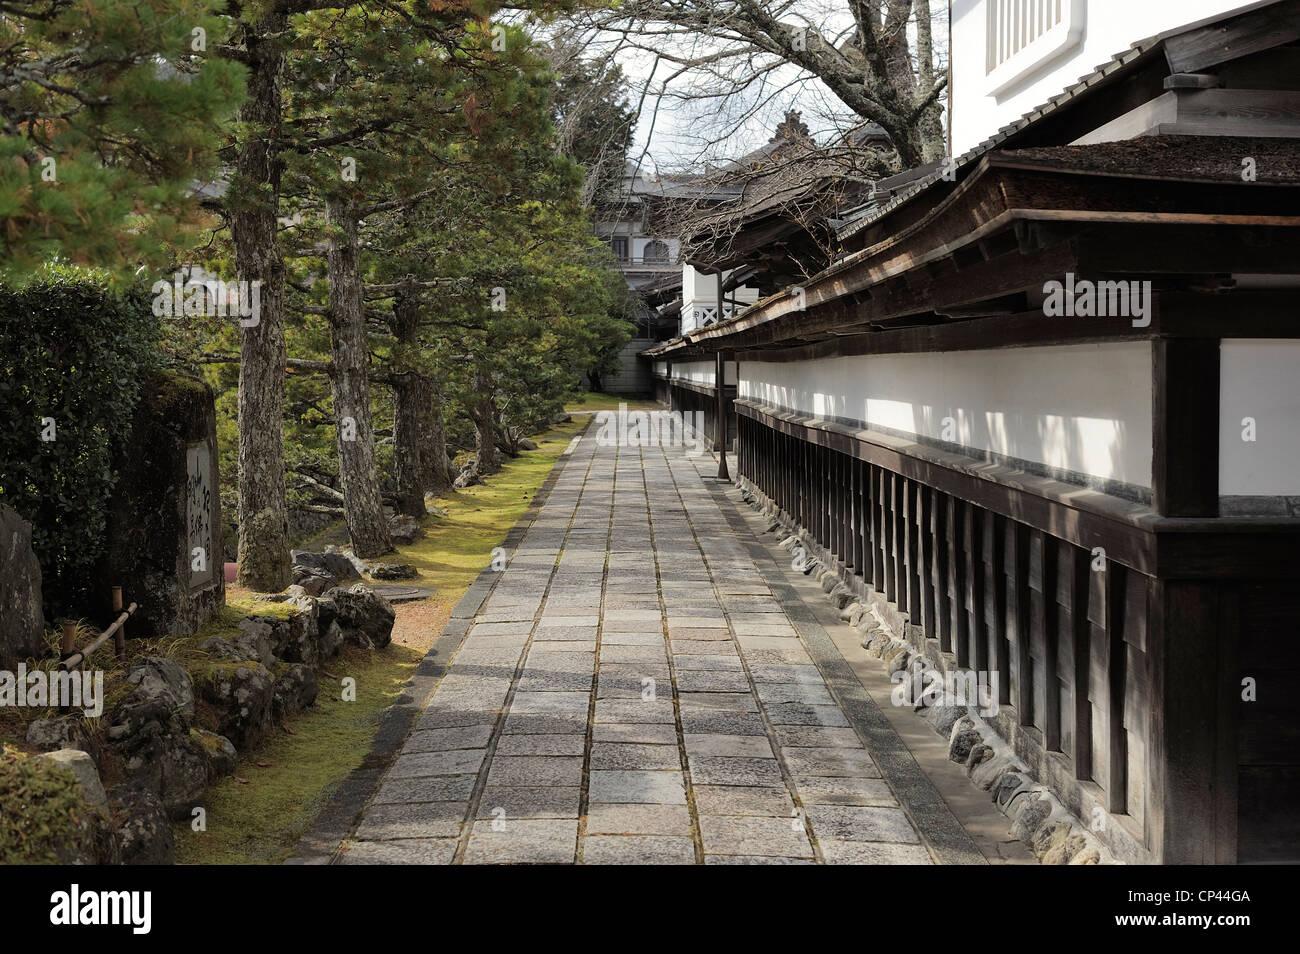 walkway flanked by conifers, Koya-San, Japan Stock Photo